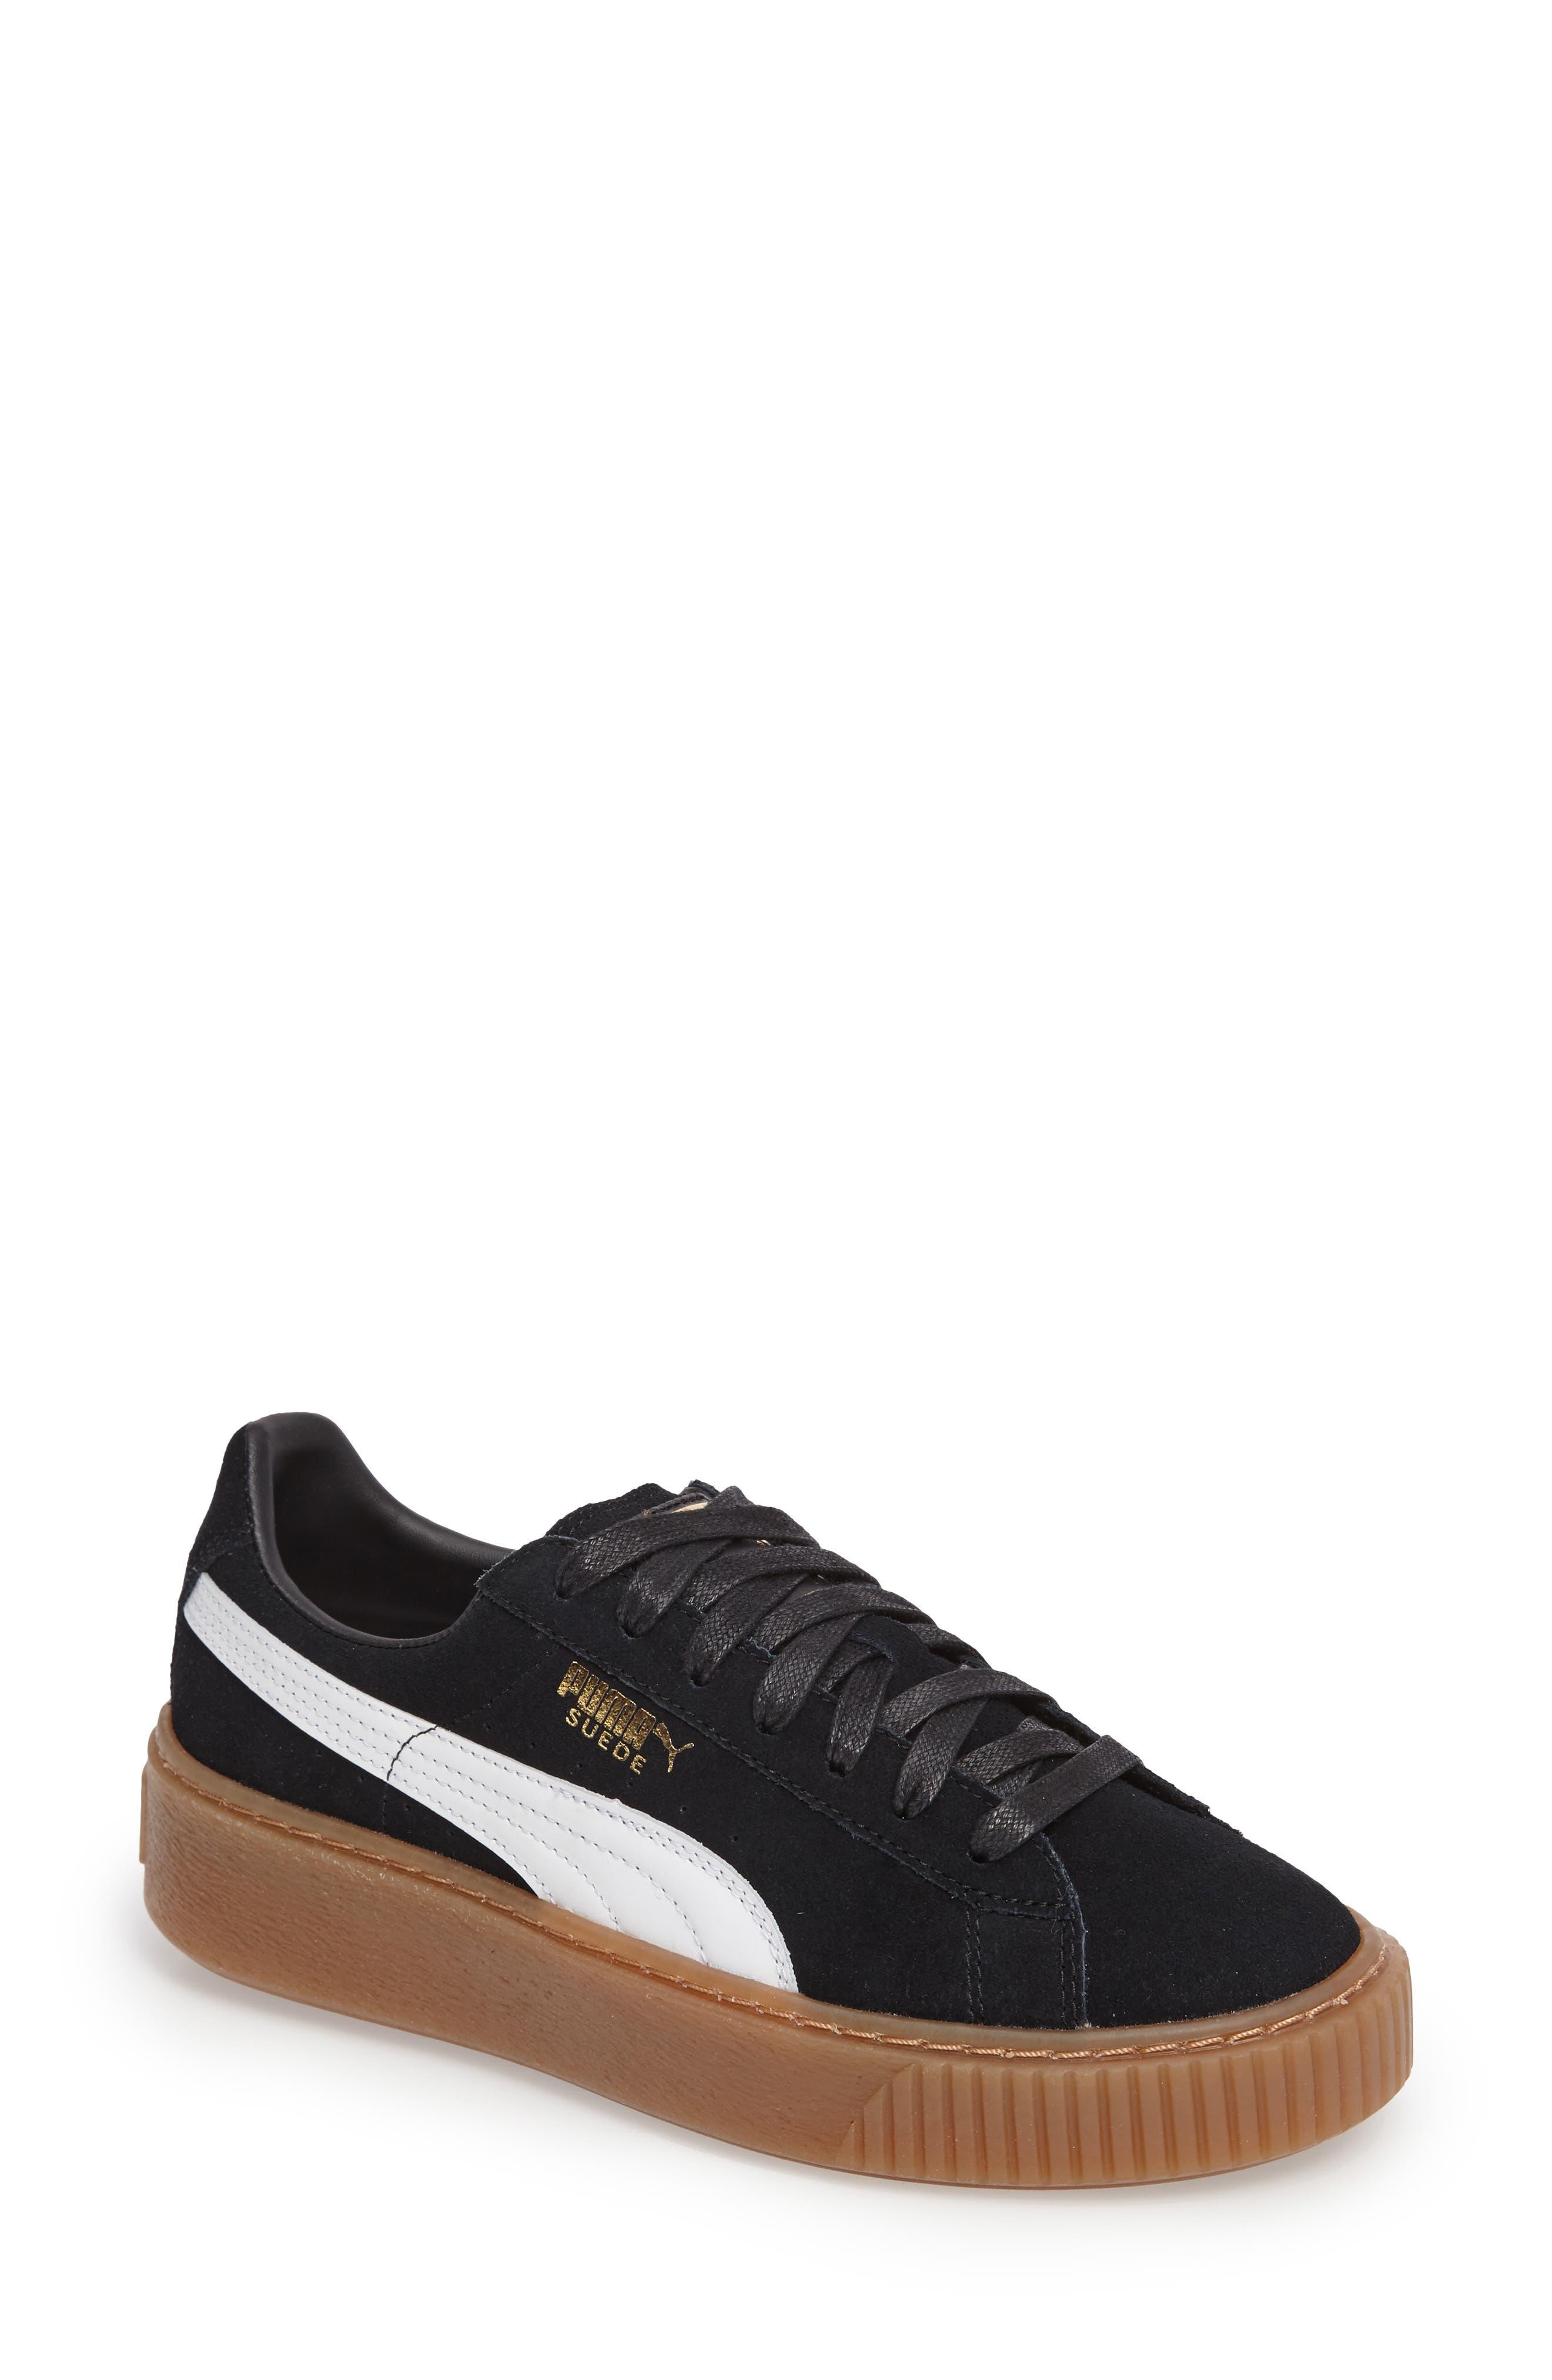 Alternate Image 1 Selected - PUMA Suede Platform Core Sneaker (Women)